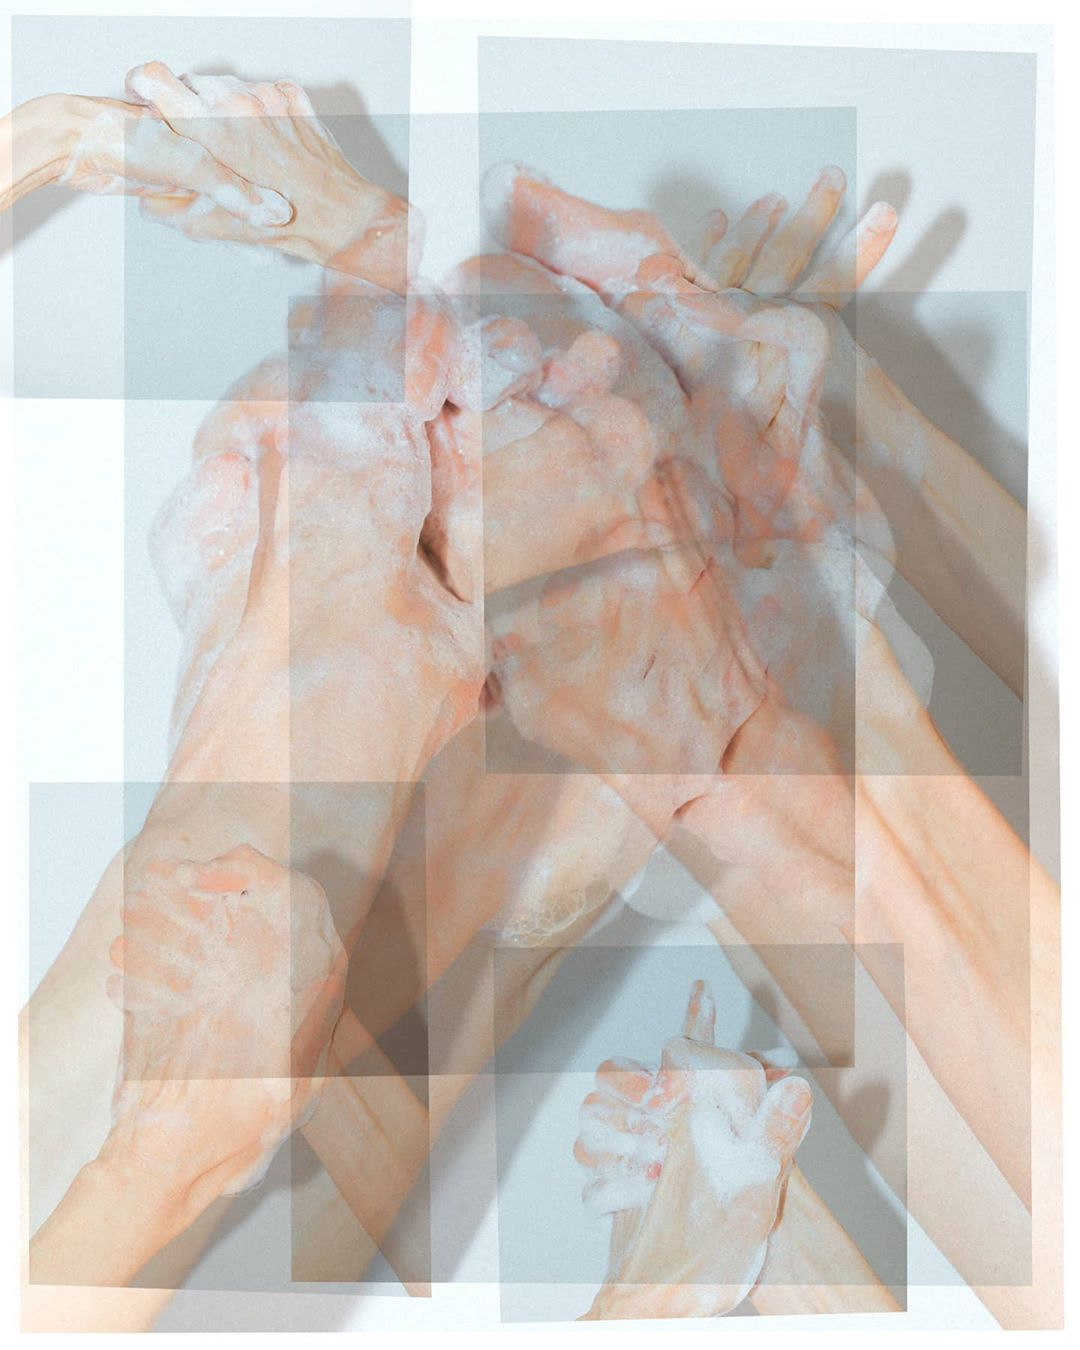 Federico Ciamei 2 C41 Magazine Covid 19 Isolation